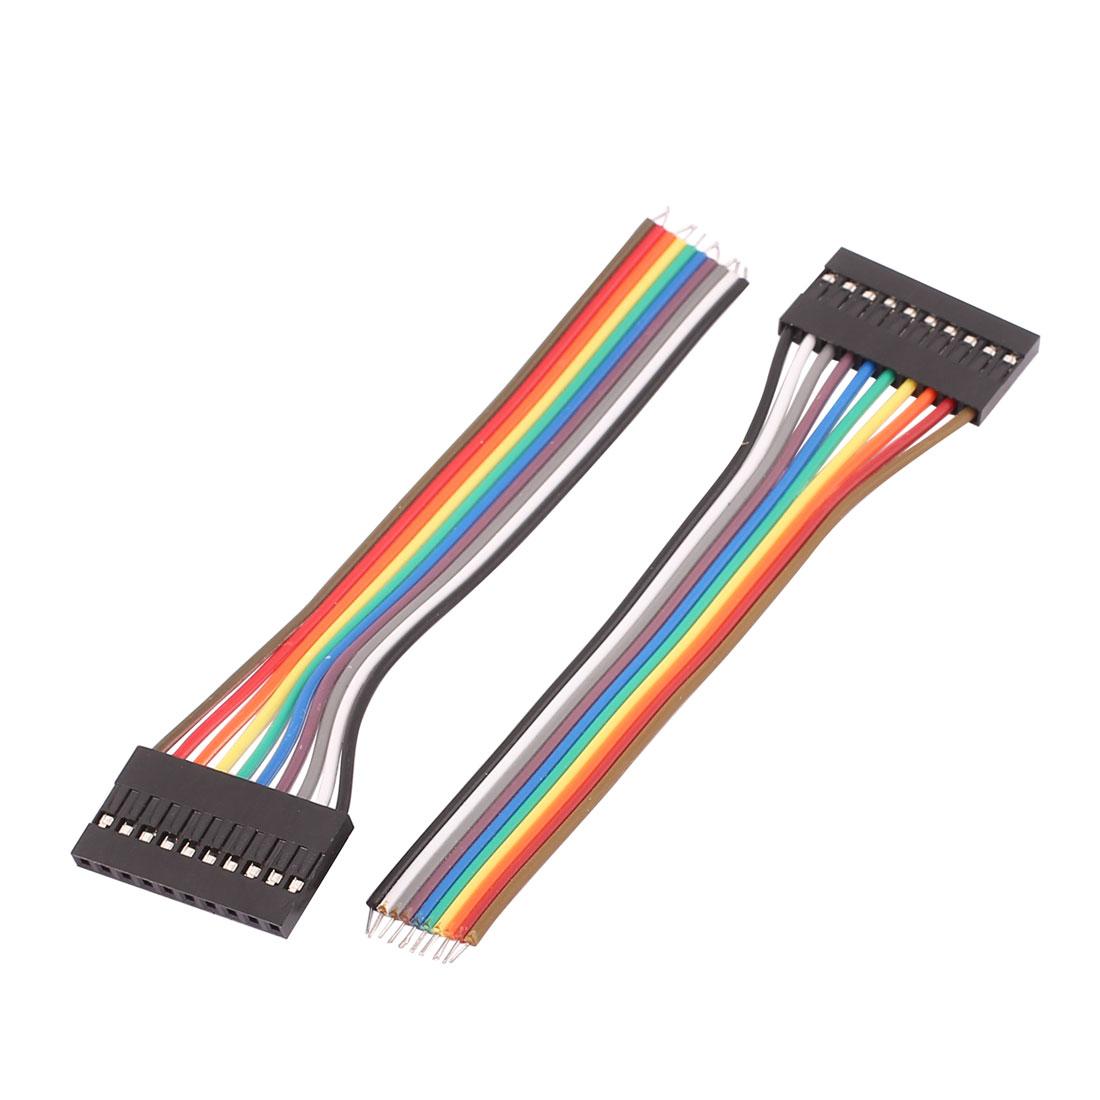 2 Pcs Female 10P Jumper Wires Ribbon Cables Pi Pic Breadboard DIY 10cm Long